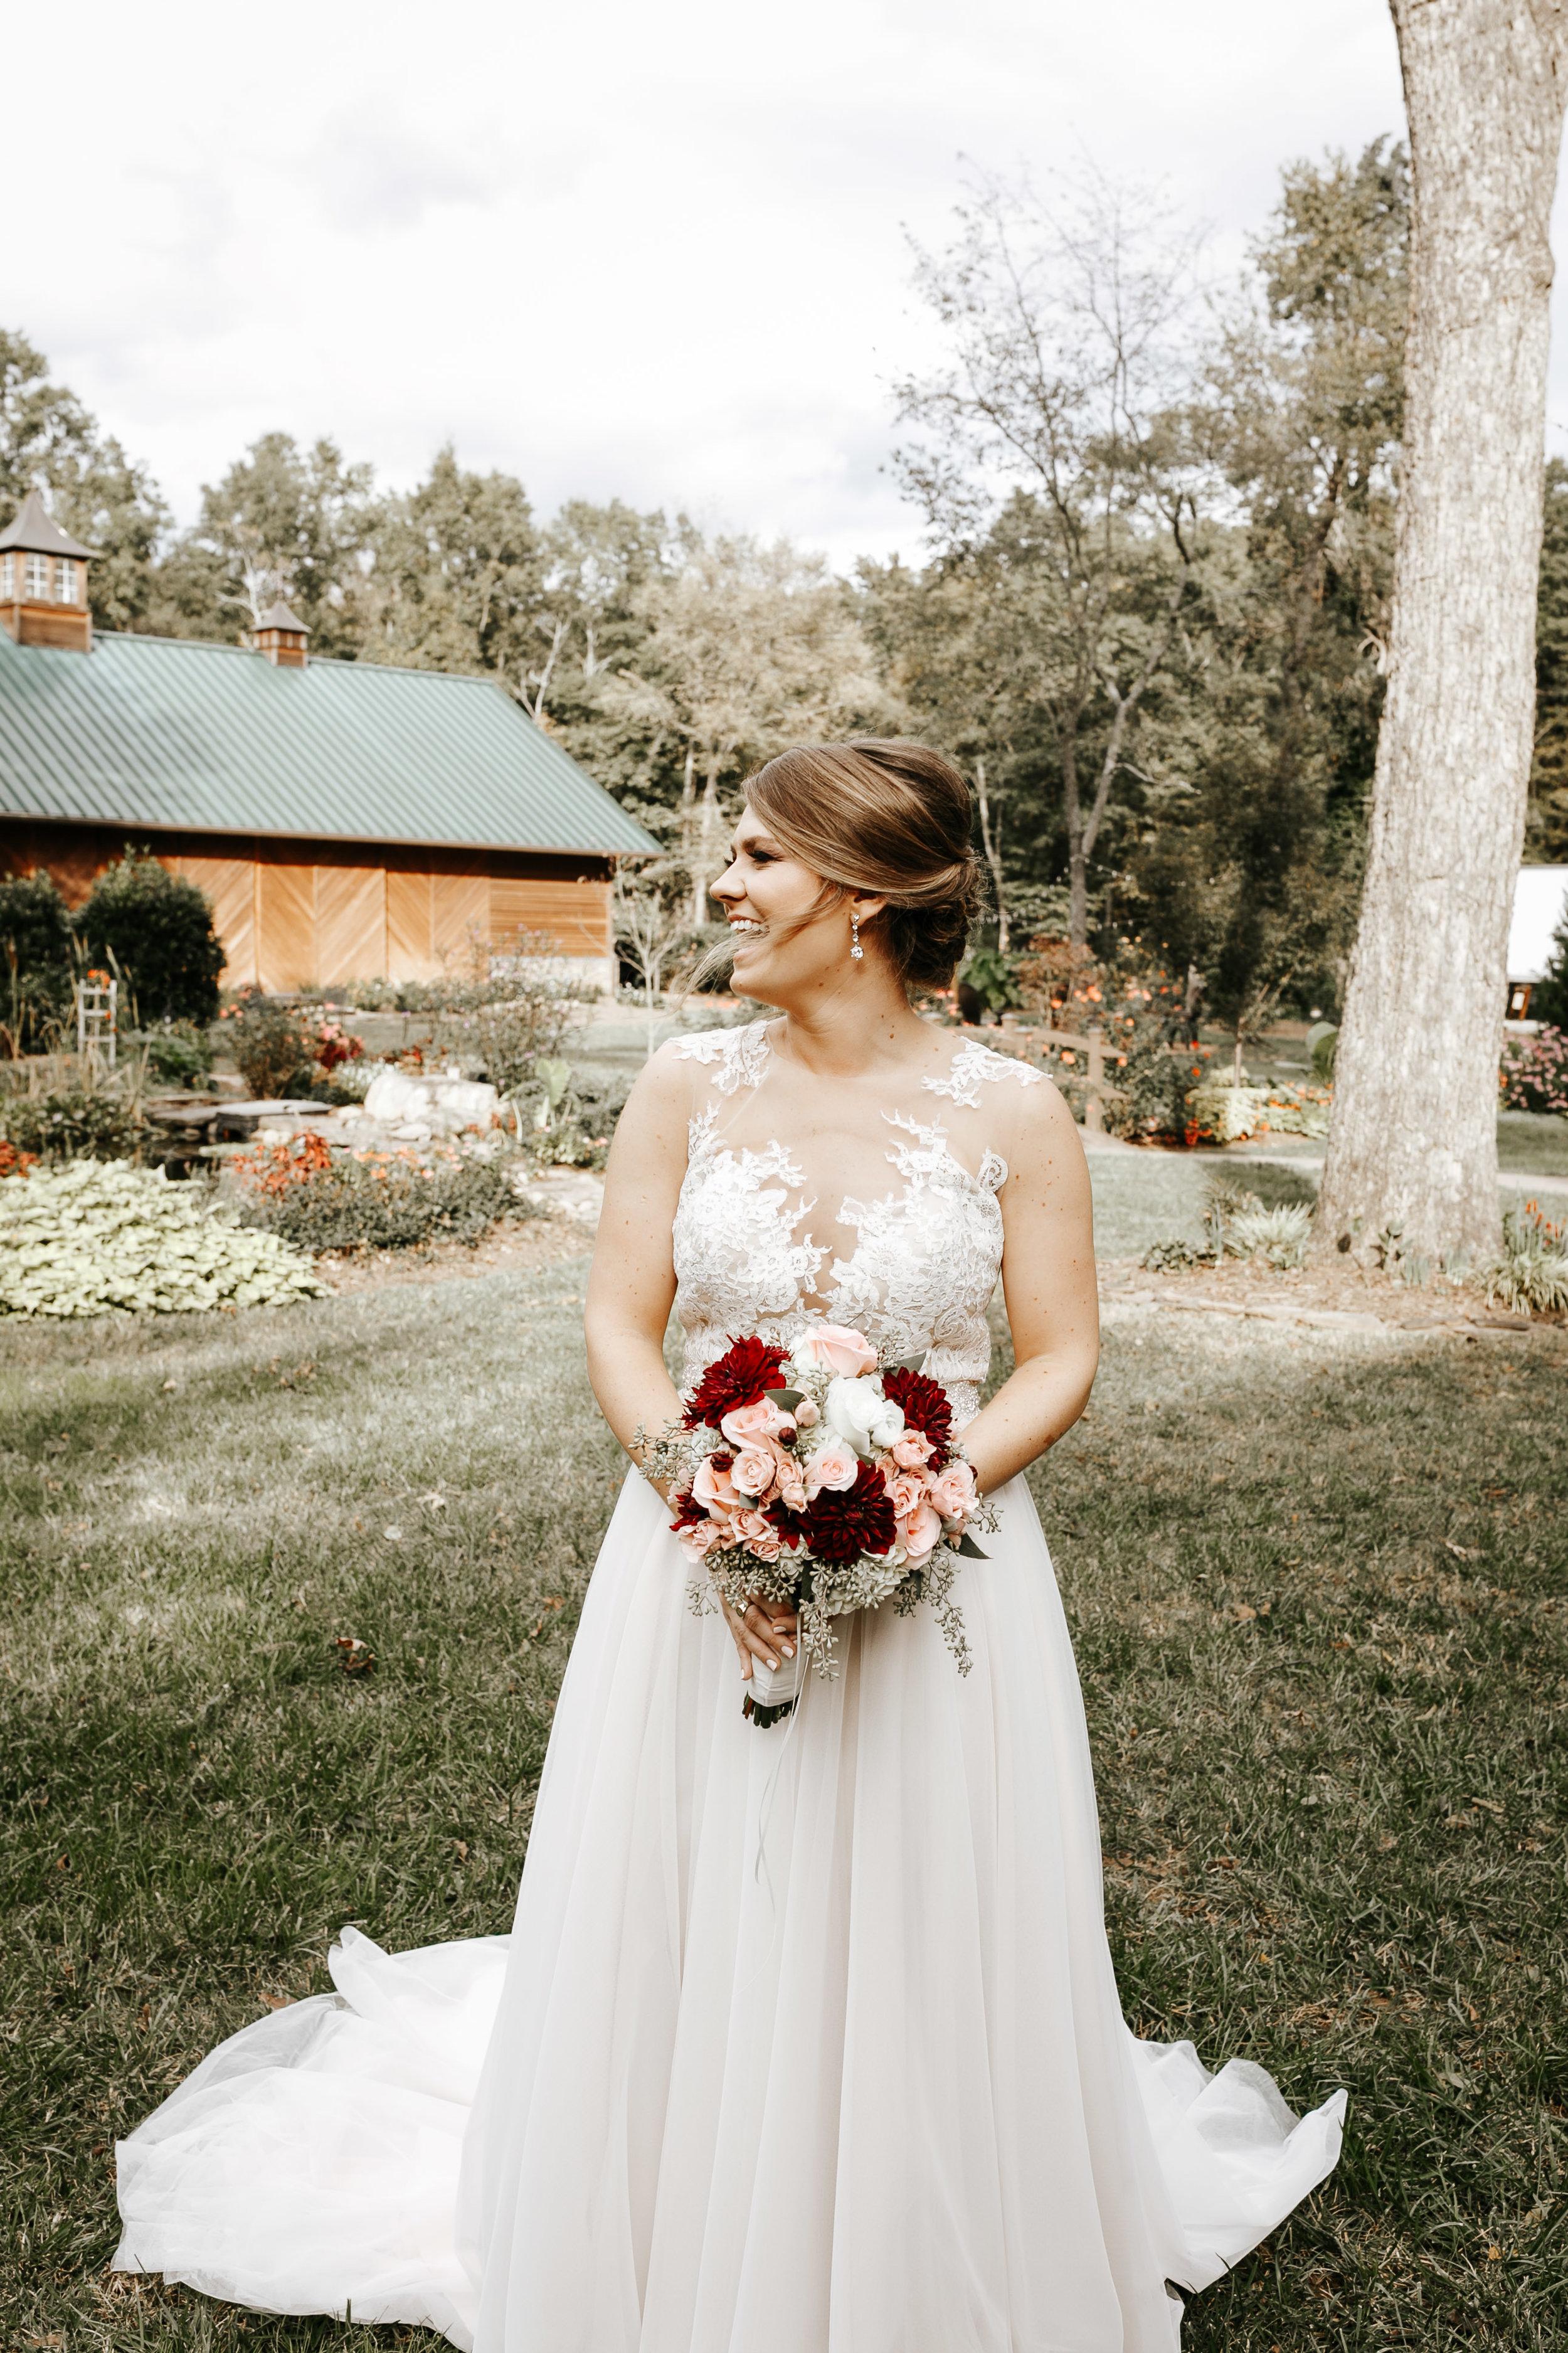 jessicabrandonwedding-23.jpg